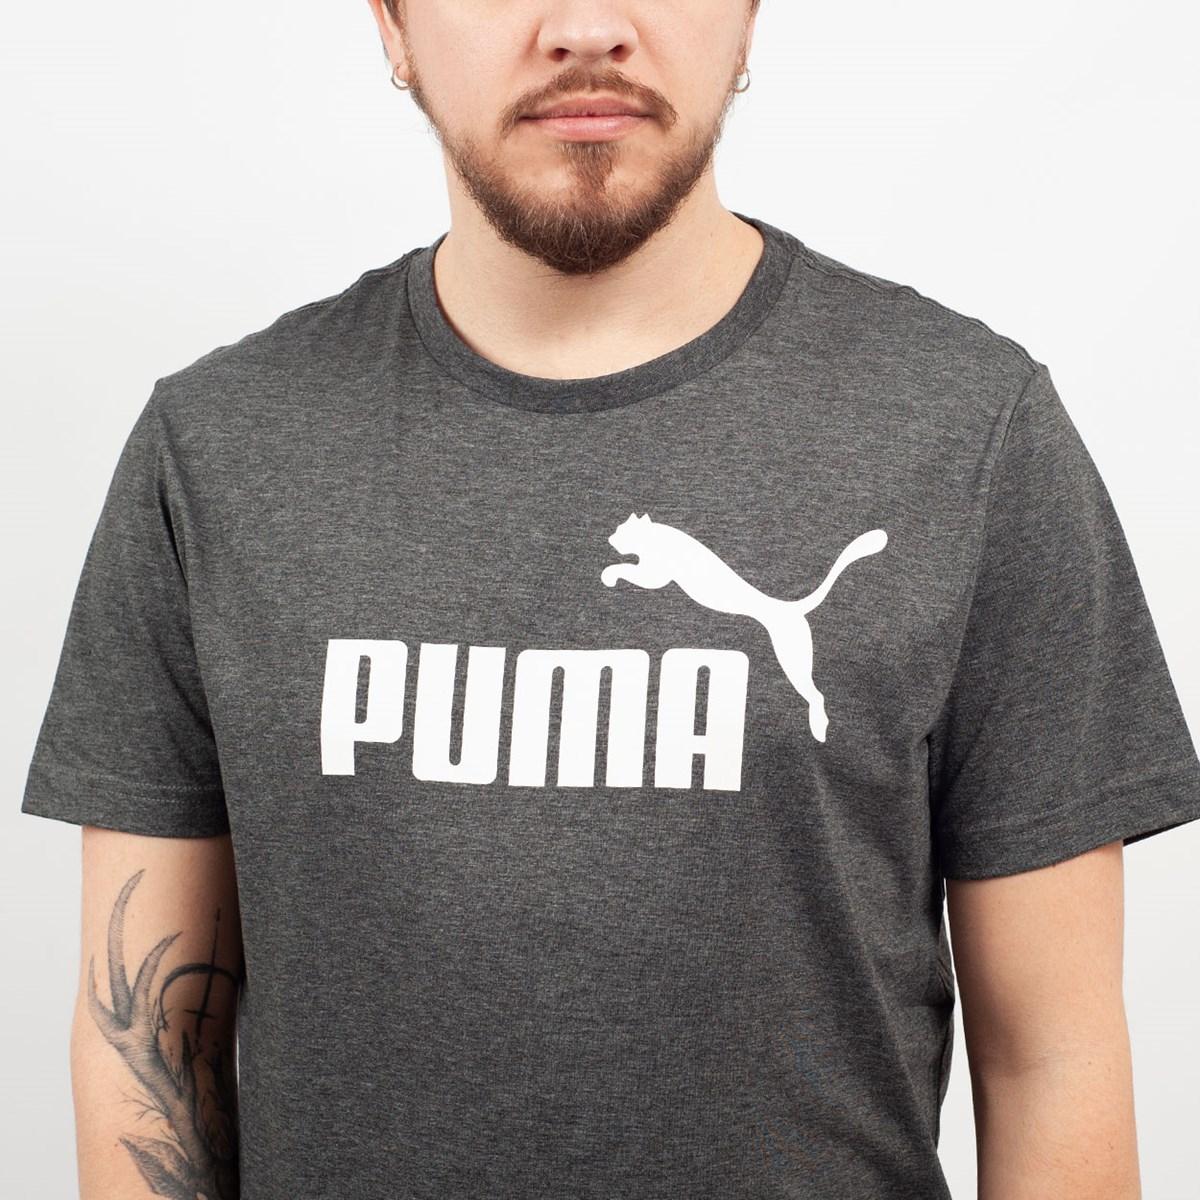 Camiseta Puma Masculina Essentials Heather Tee Preto 85241901